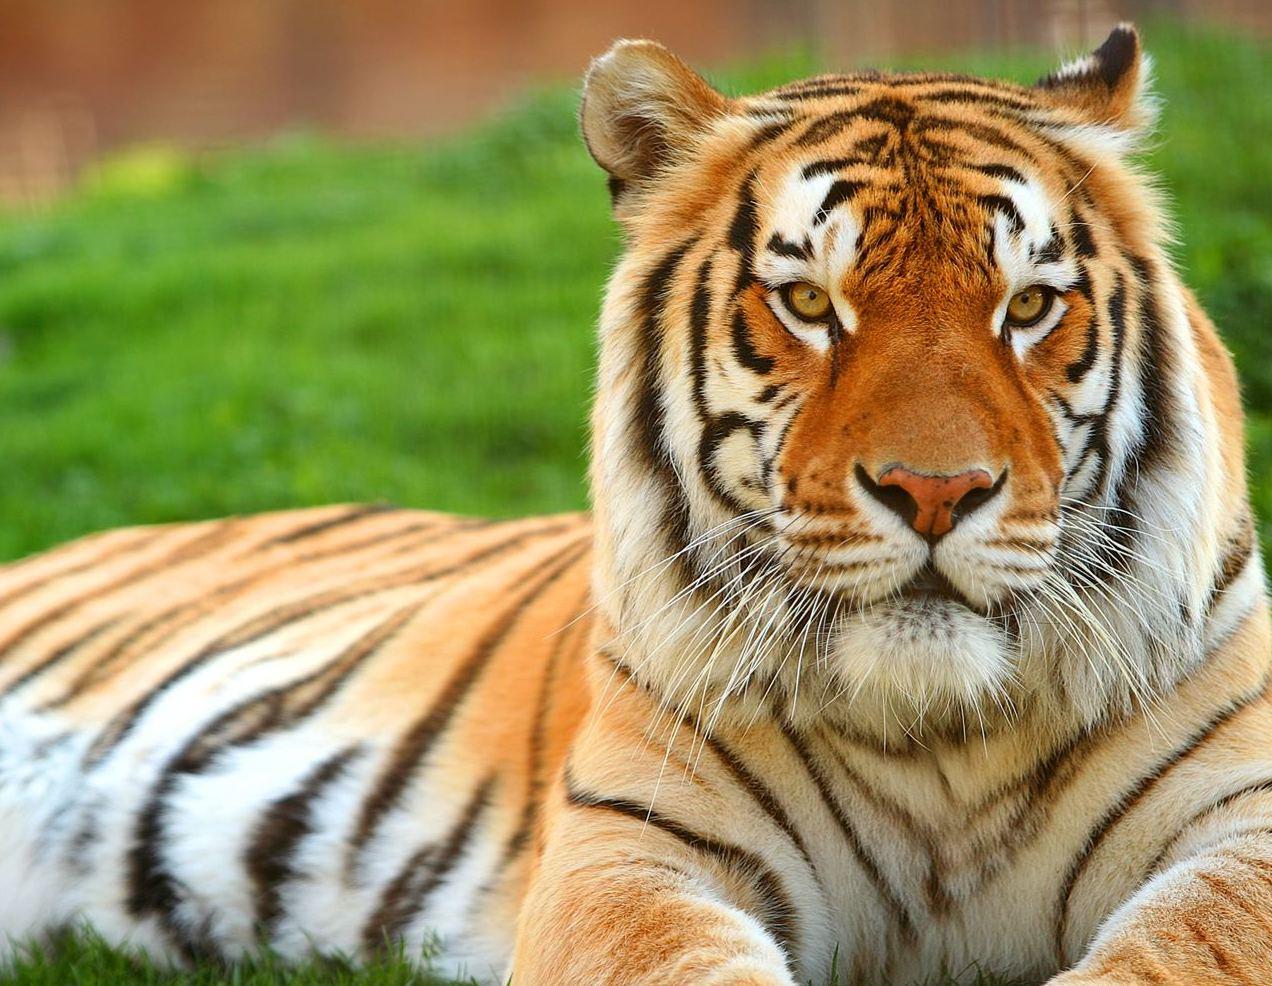 High Resolution Tiger